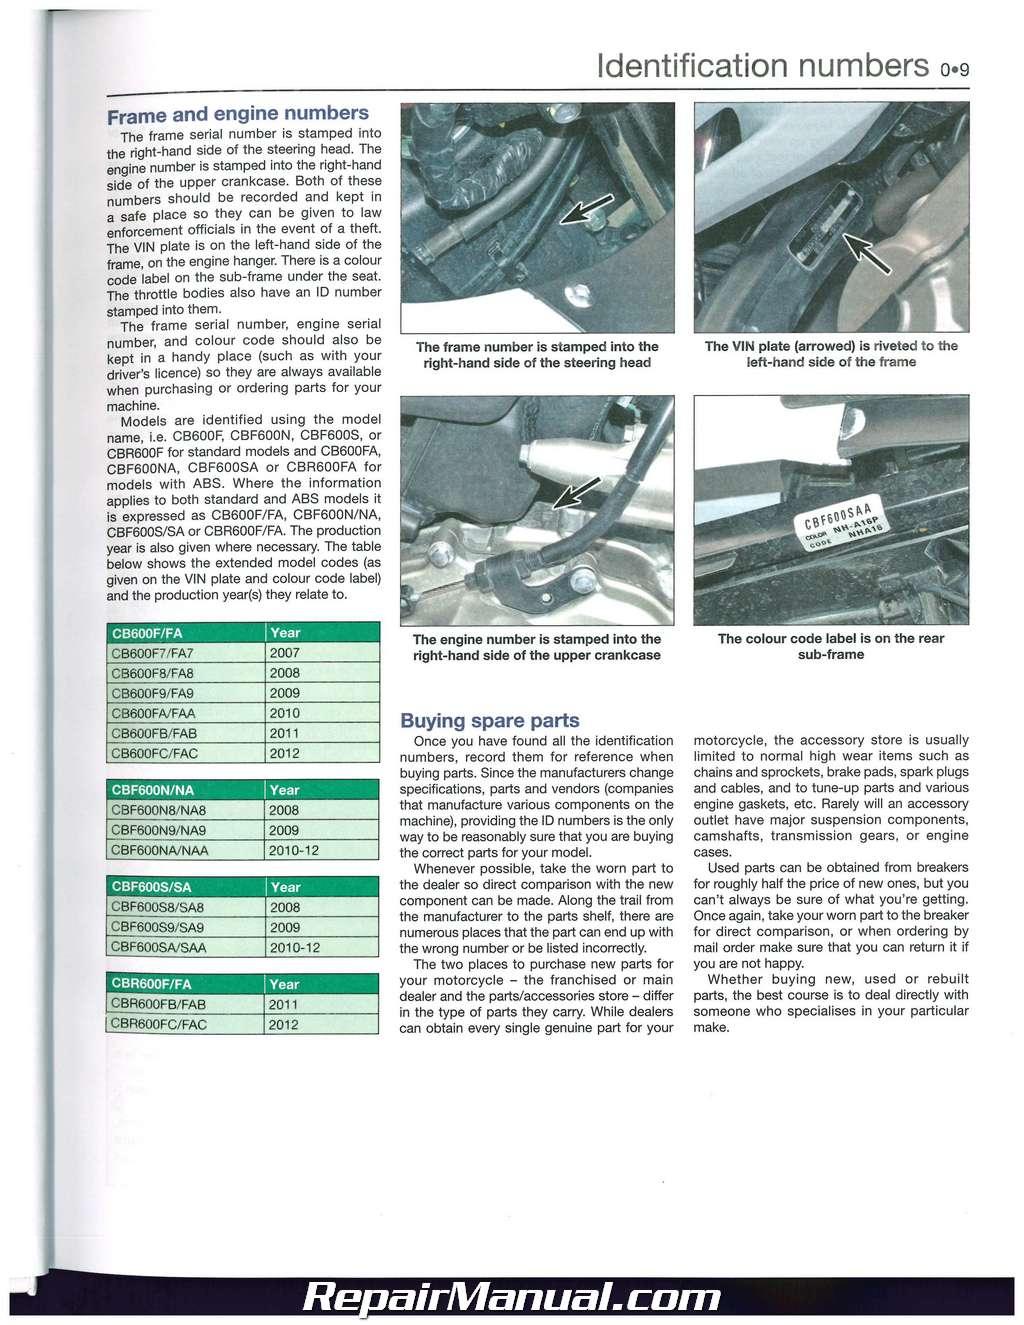 1989 Cbr 600 Service Manual